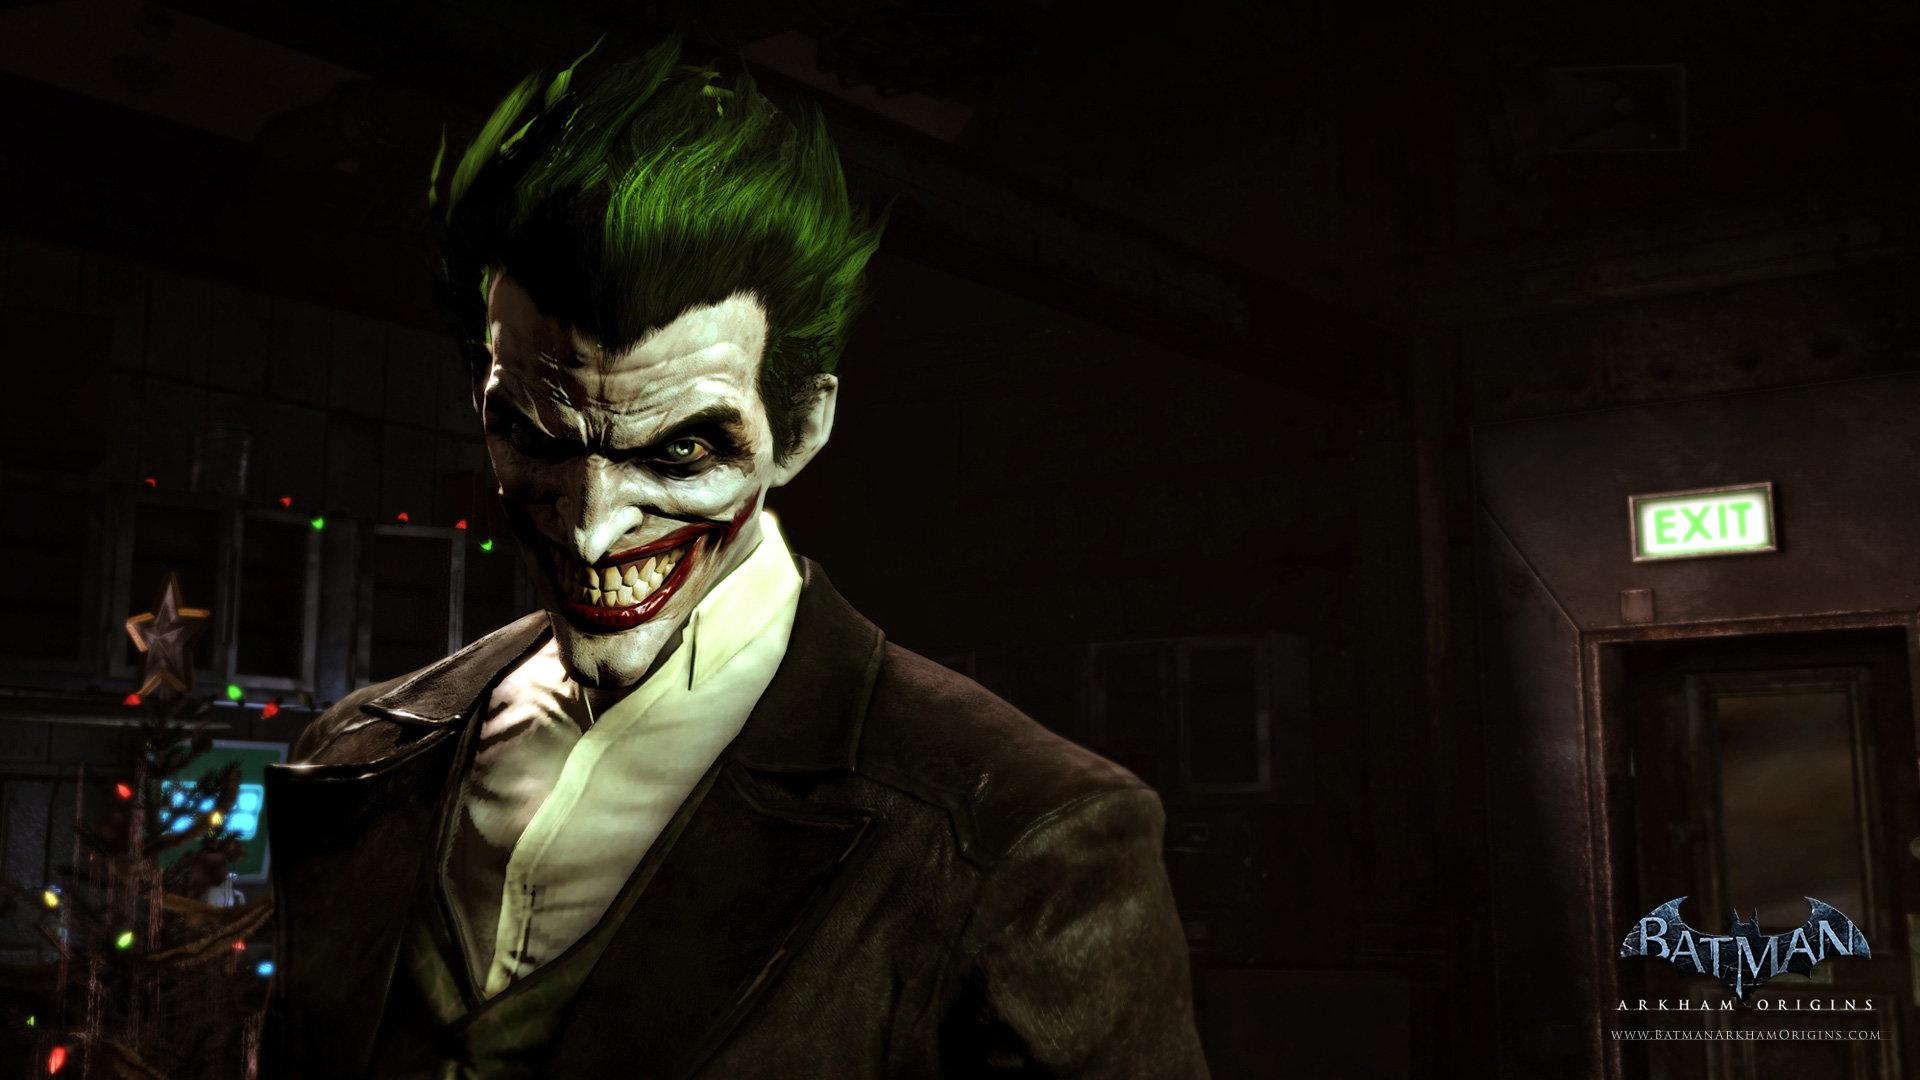 Batman Arkham Origins HD Backgrounds For 1920x1080 Full 1080p Desktop